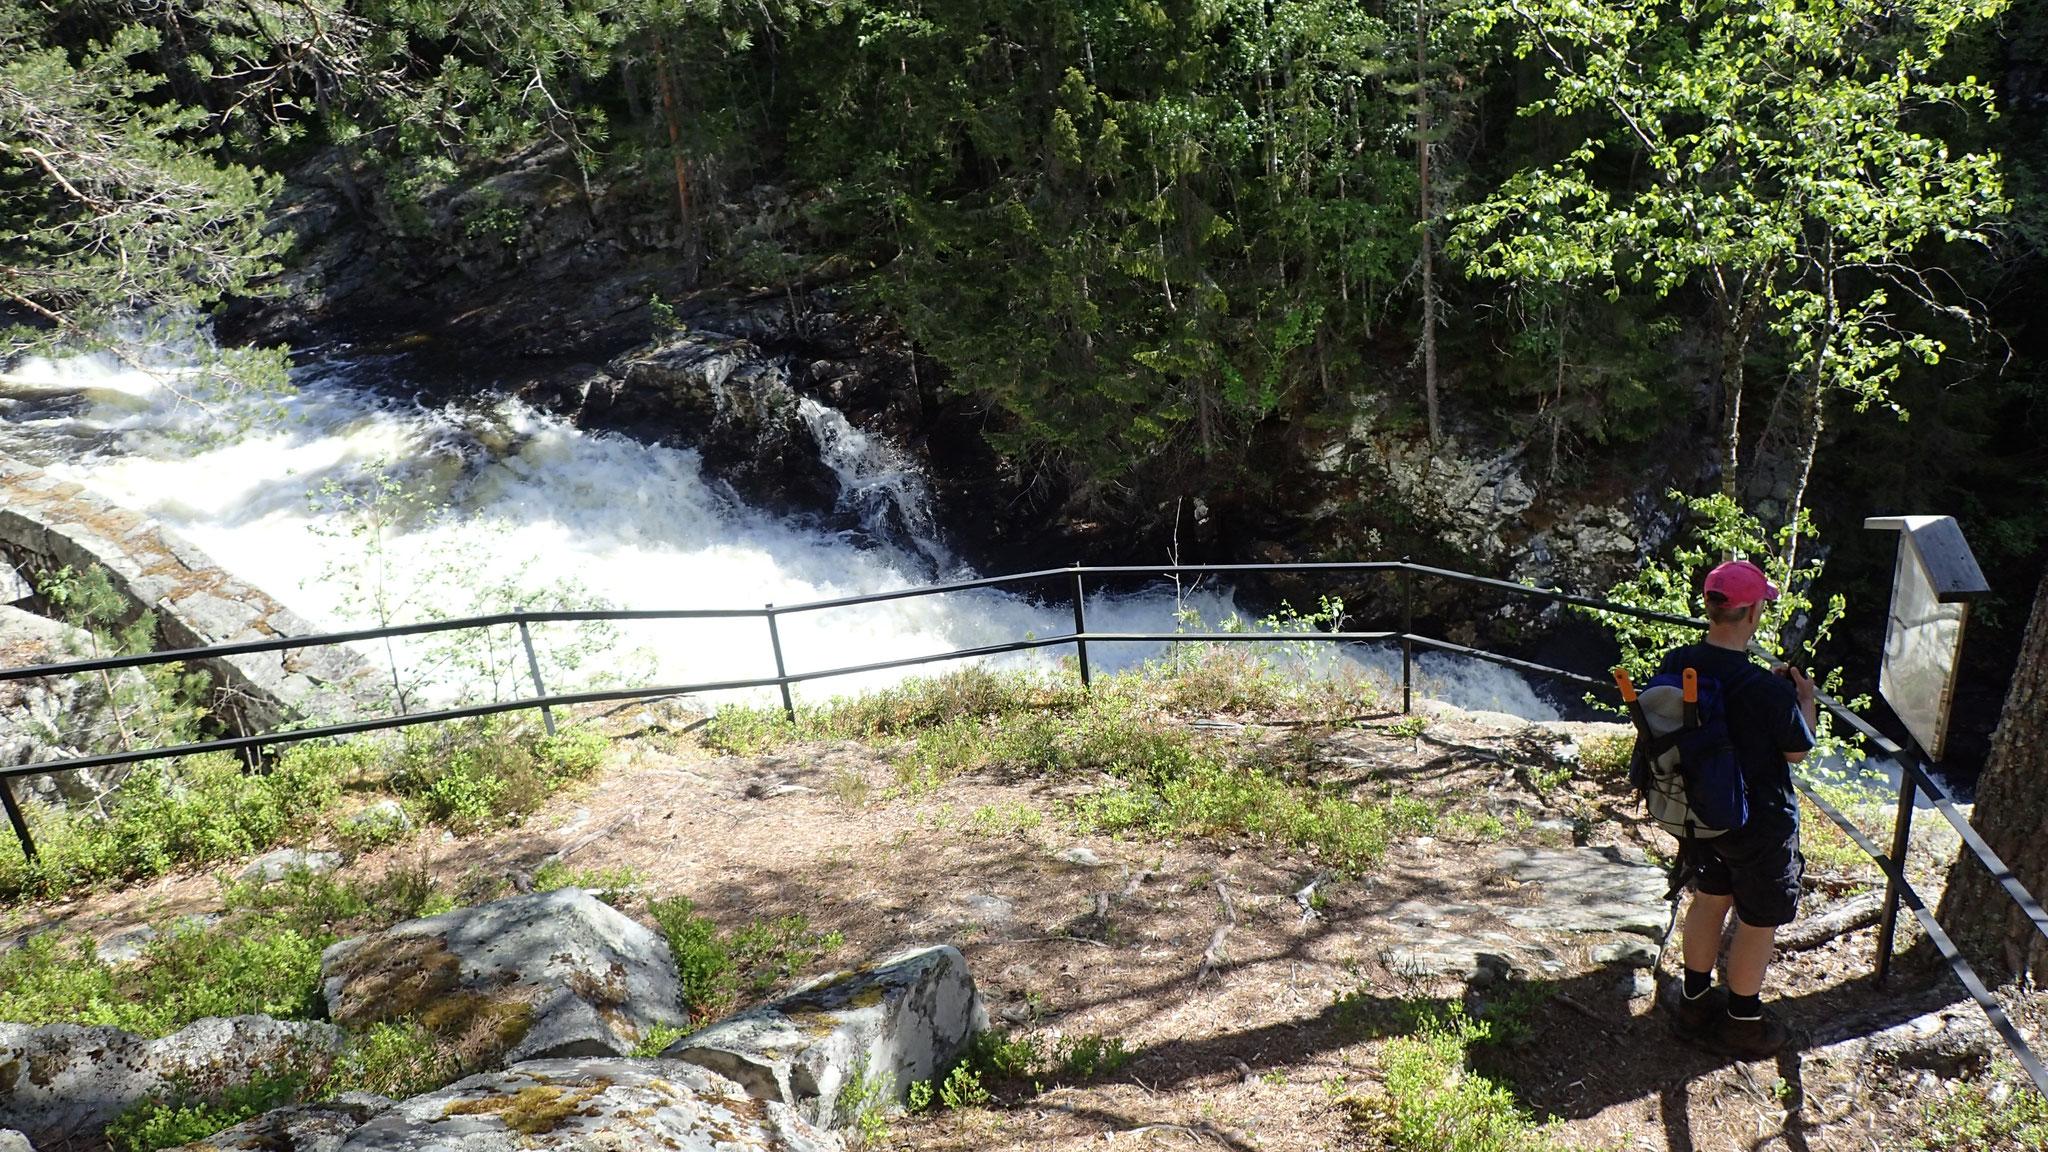 Aussichtsplattform über dem Rauatunnelen und Rauawasserfall